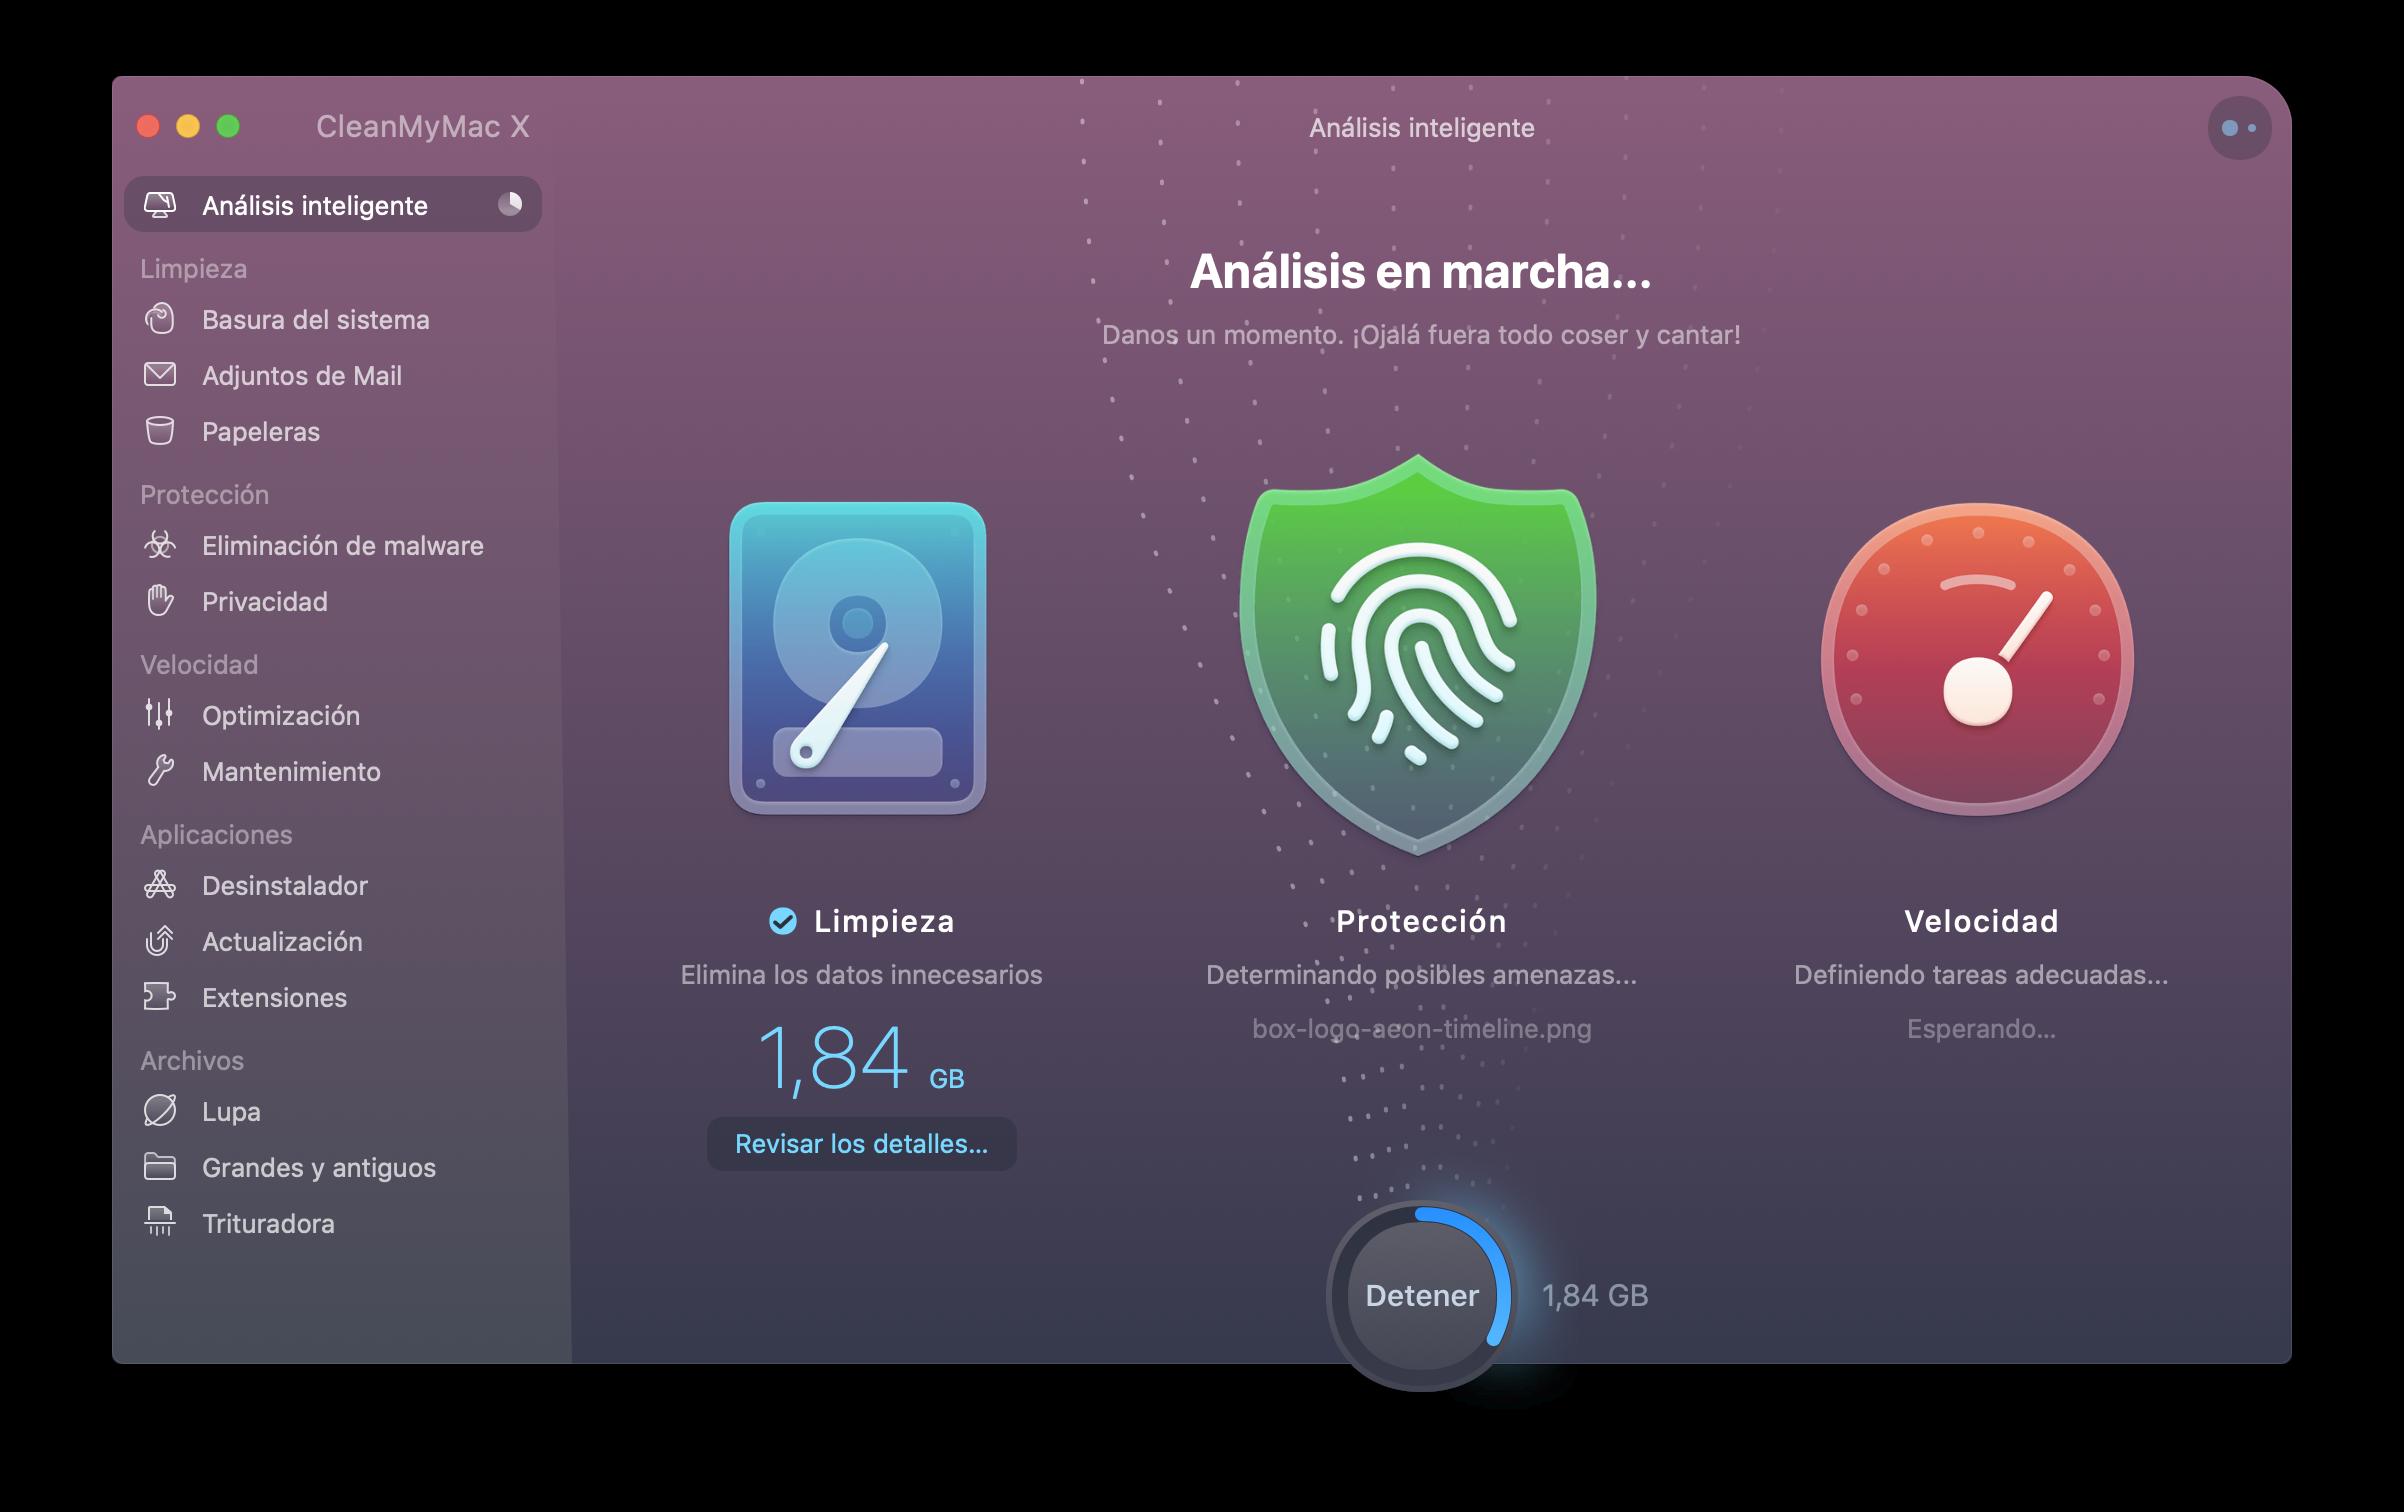 CleanMyMac X Análisis inteligente en marcha